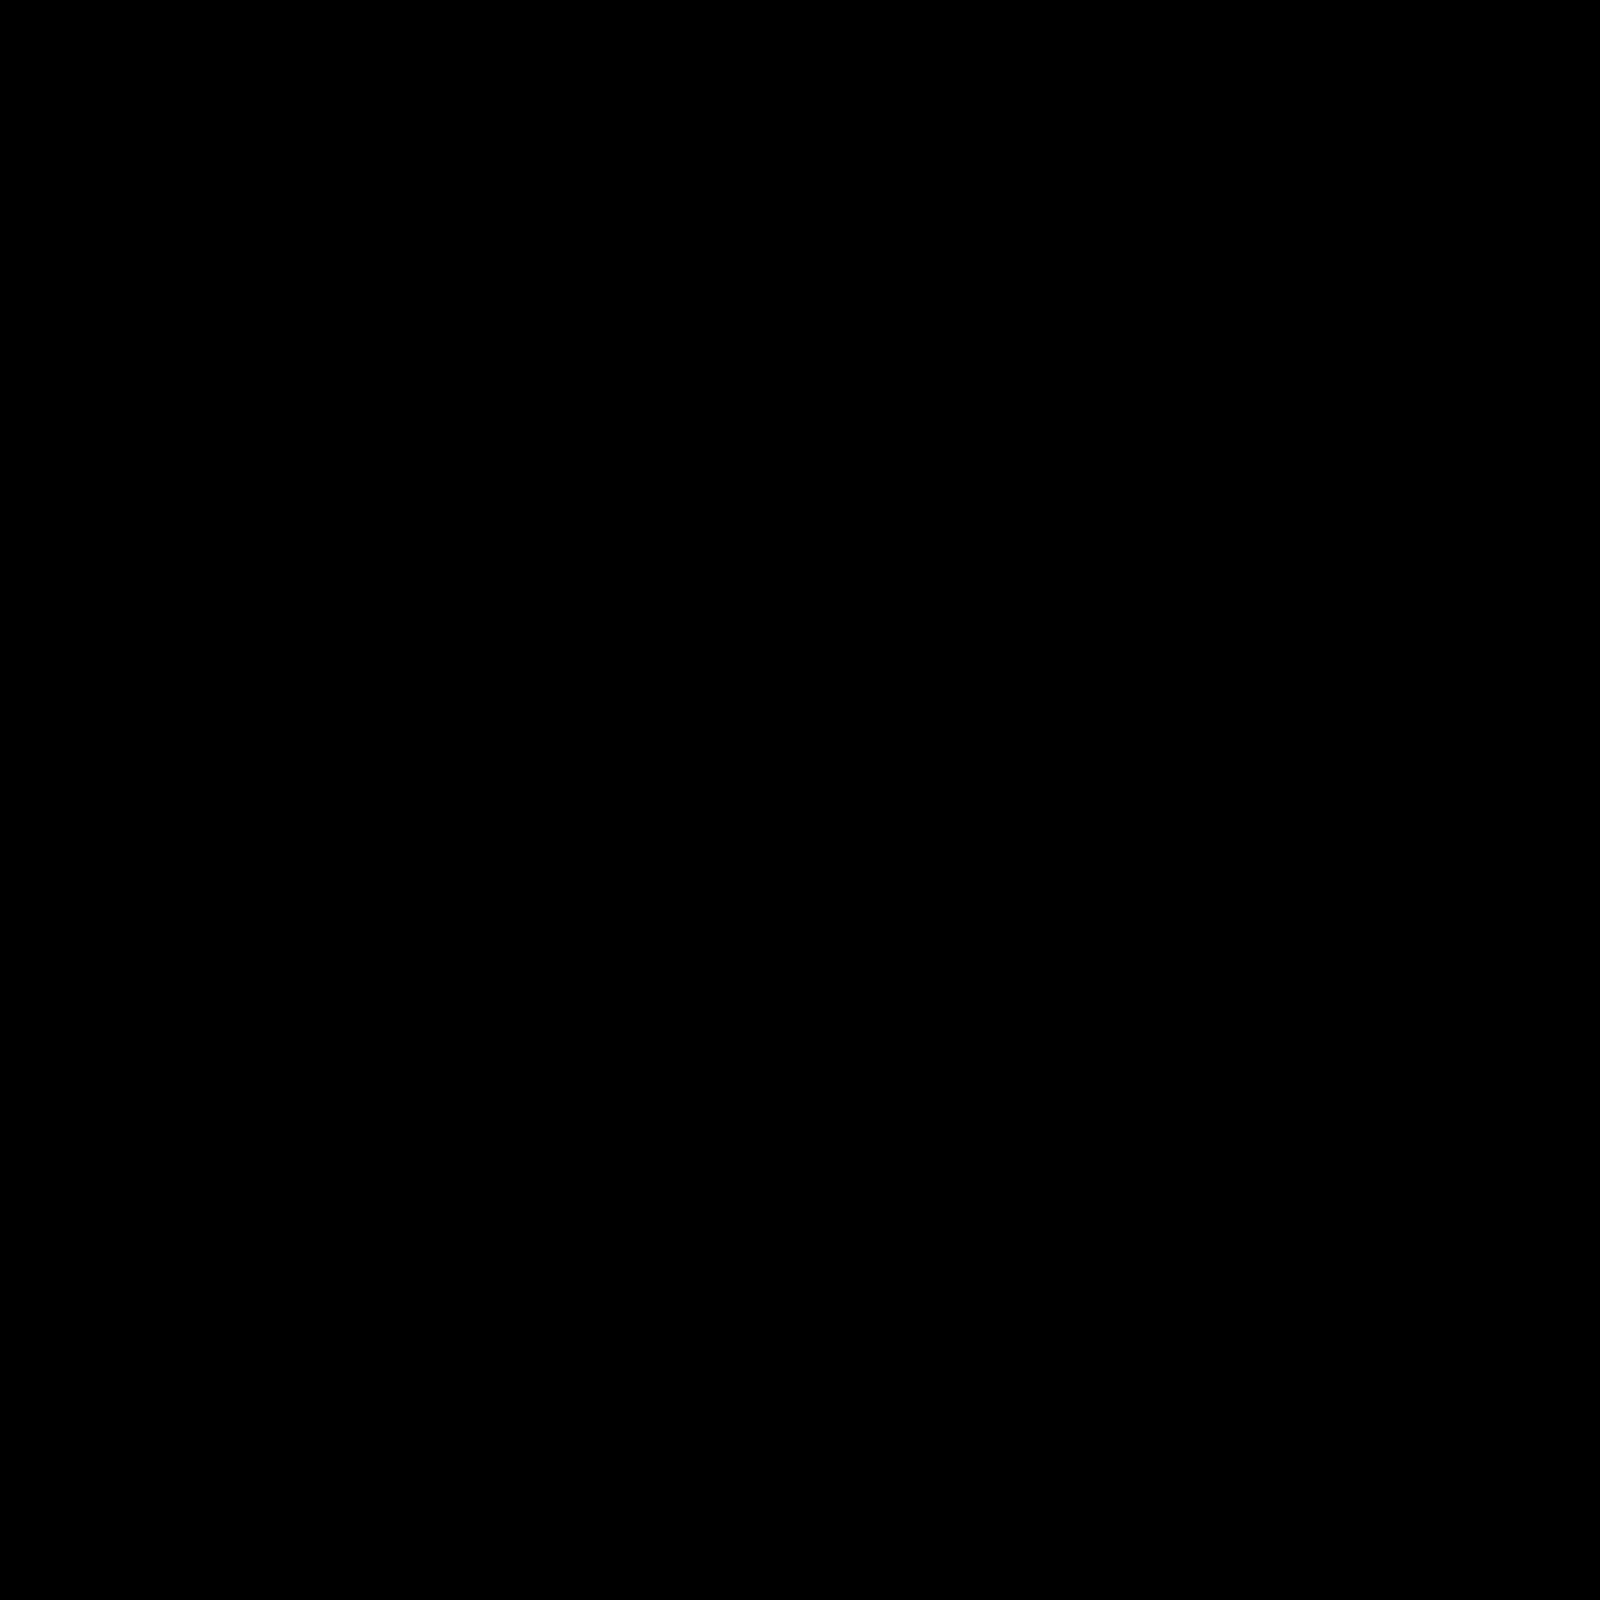 Globo terráqueo icon